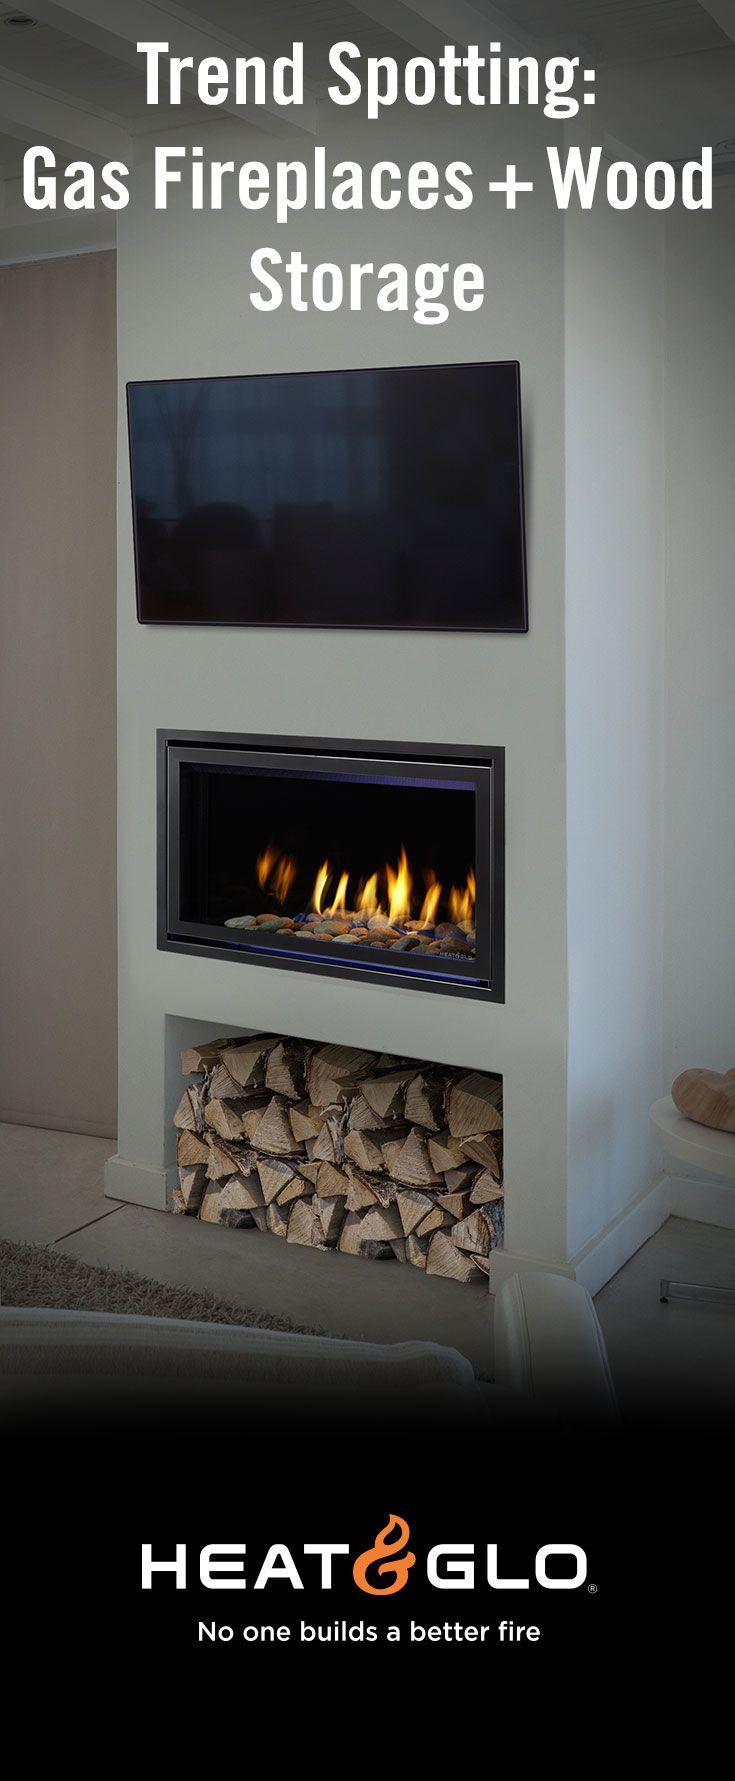 Trend Spotting Wood Storage Gas Fireplaces Coastal Interiors